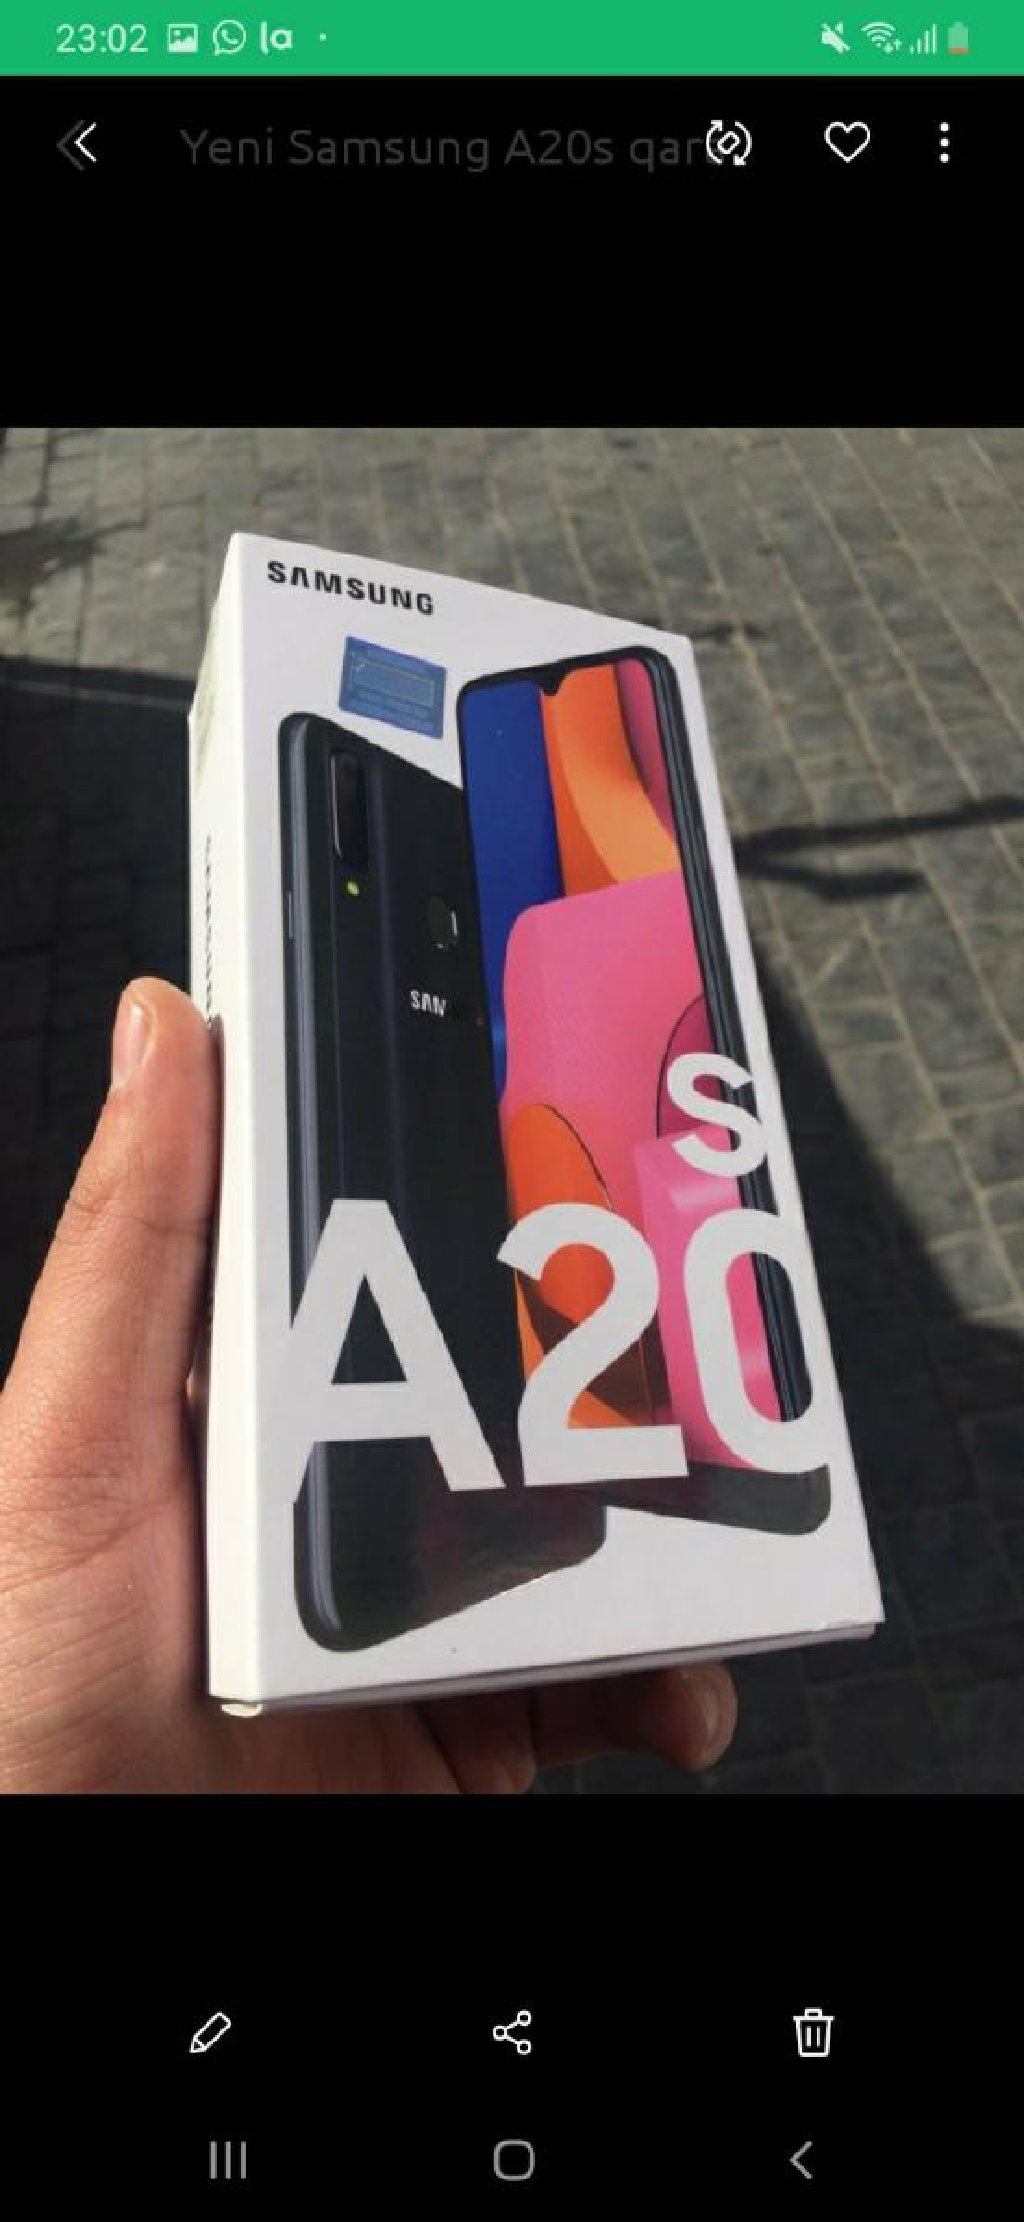 Yeni Samsung A20s 128 GB